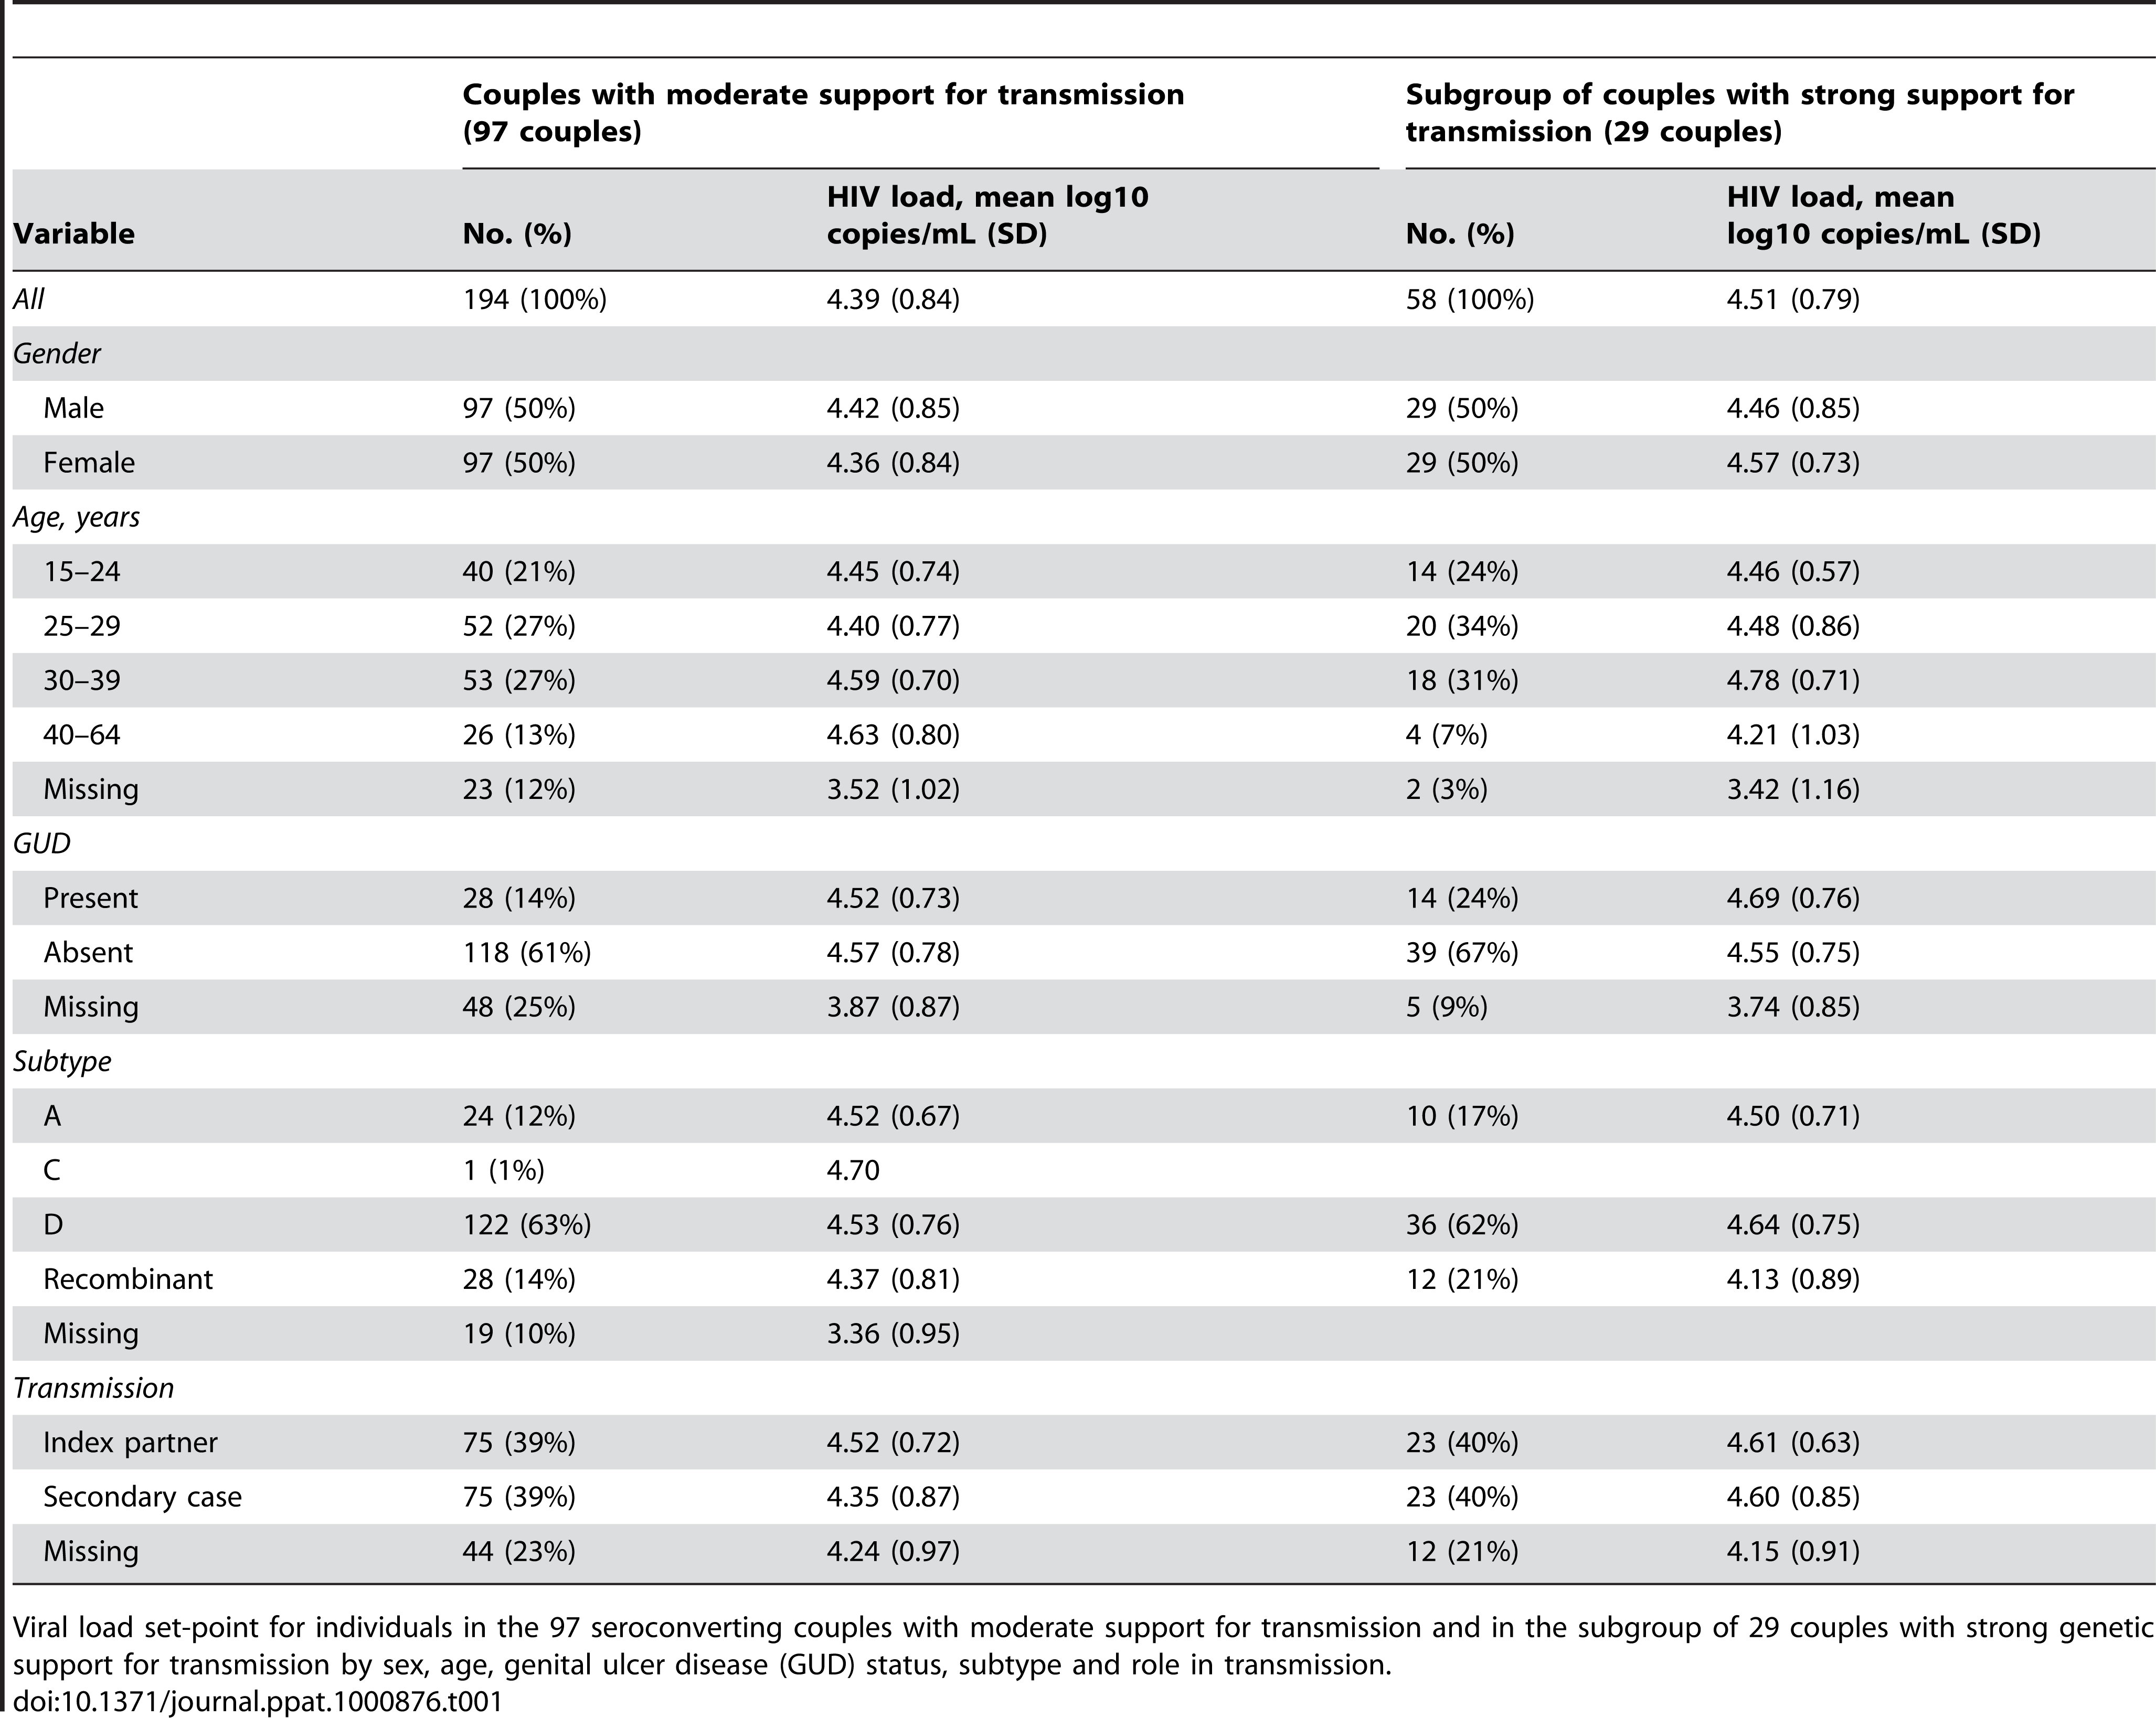 Mean log<sub>10</sub> HIV load set-point.